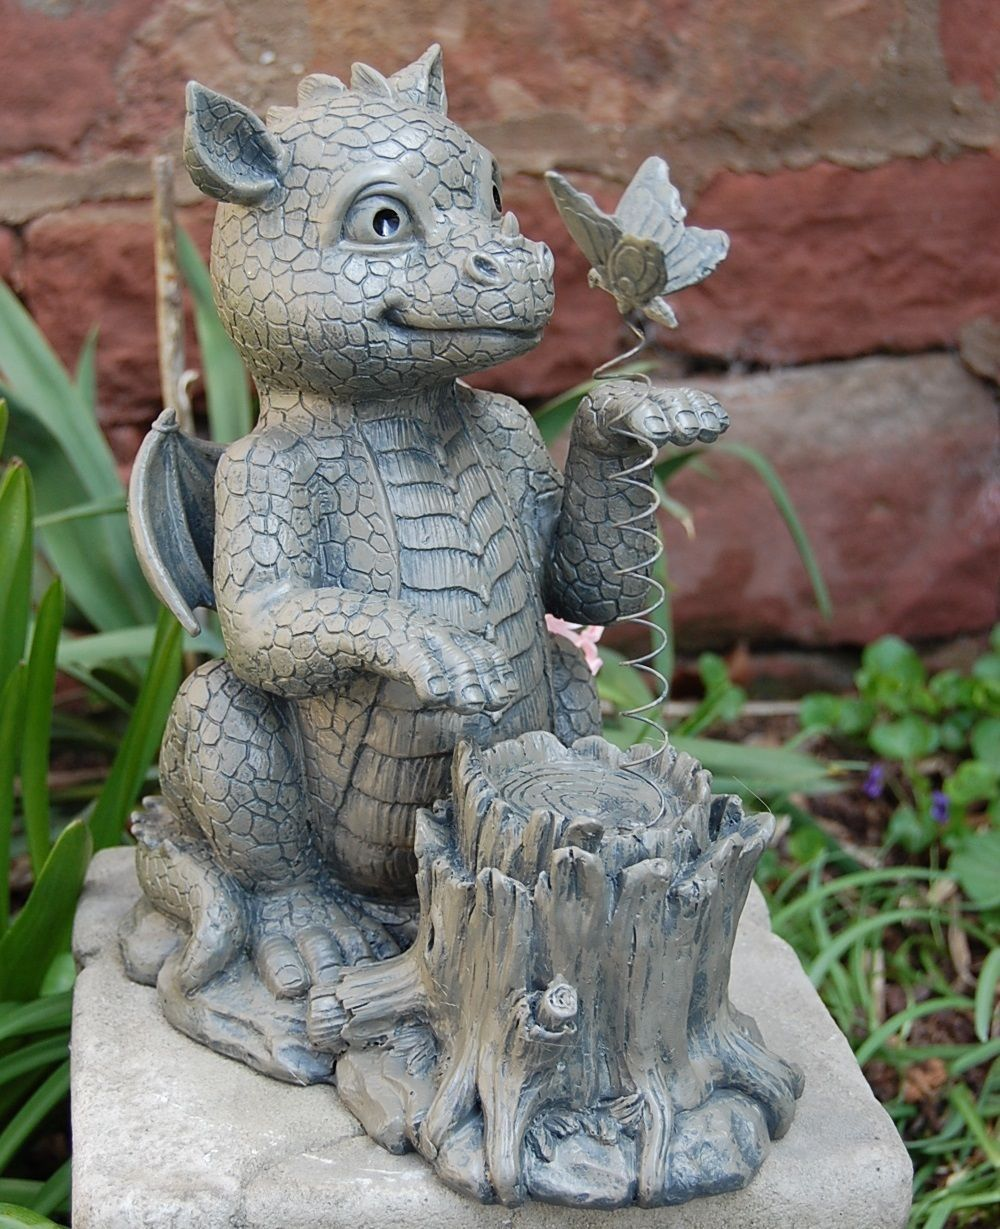 gartenfigur drache mit schmetterling frostfest torwächter gargoyle, Garten ideen